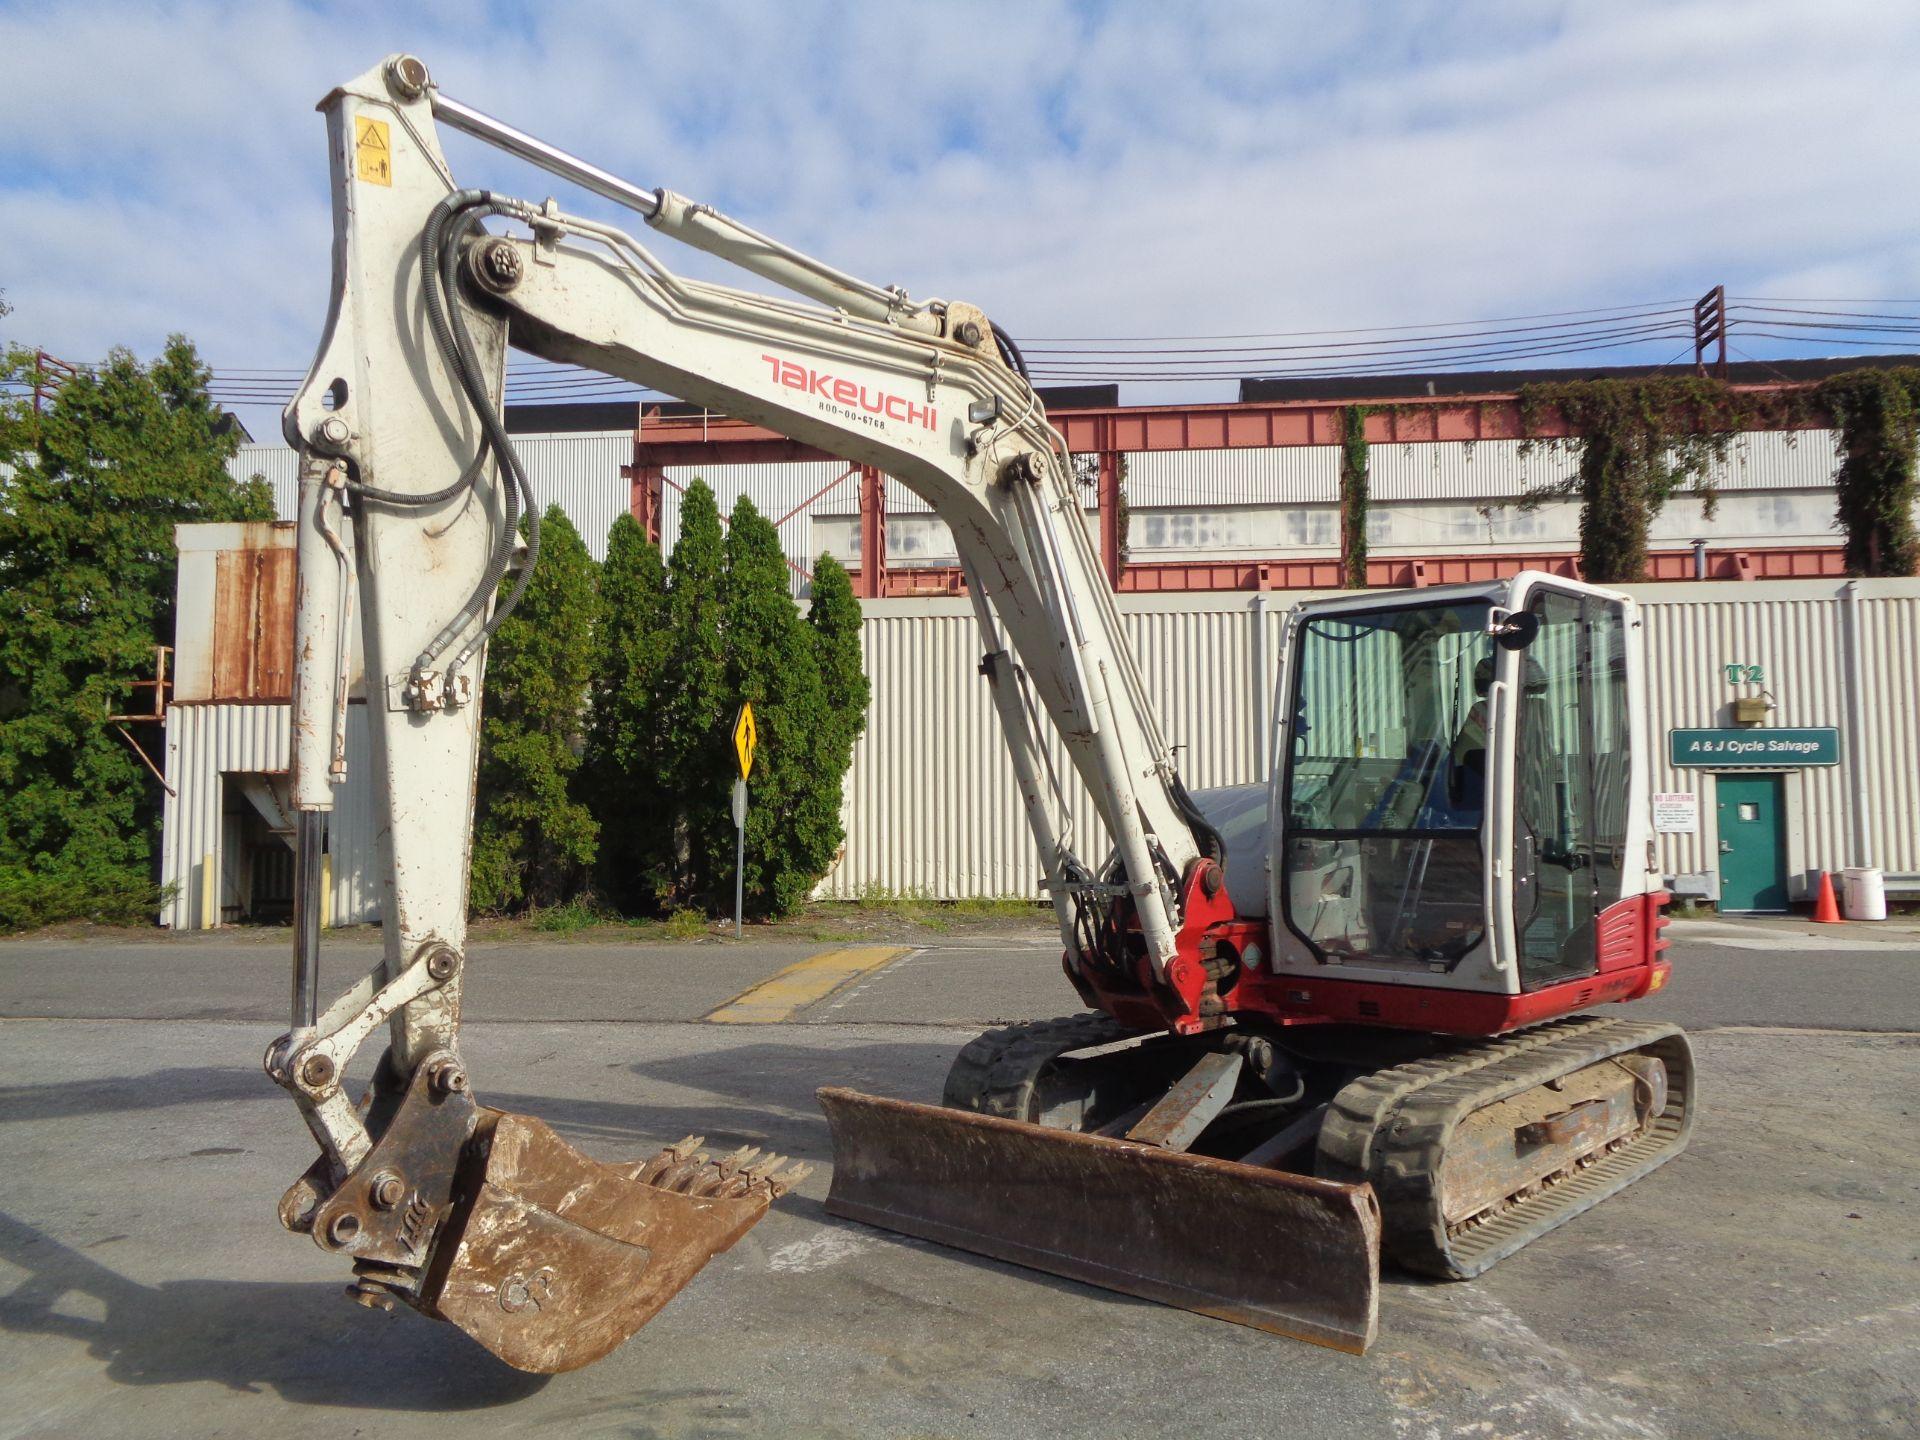 Lot 31 - 2014 Takeuchi TB285 Excavator